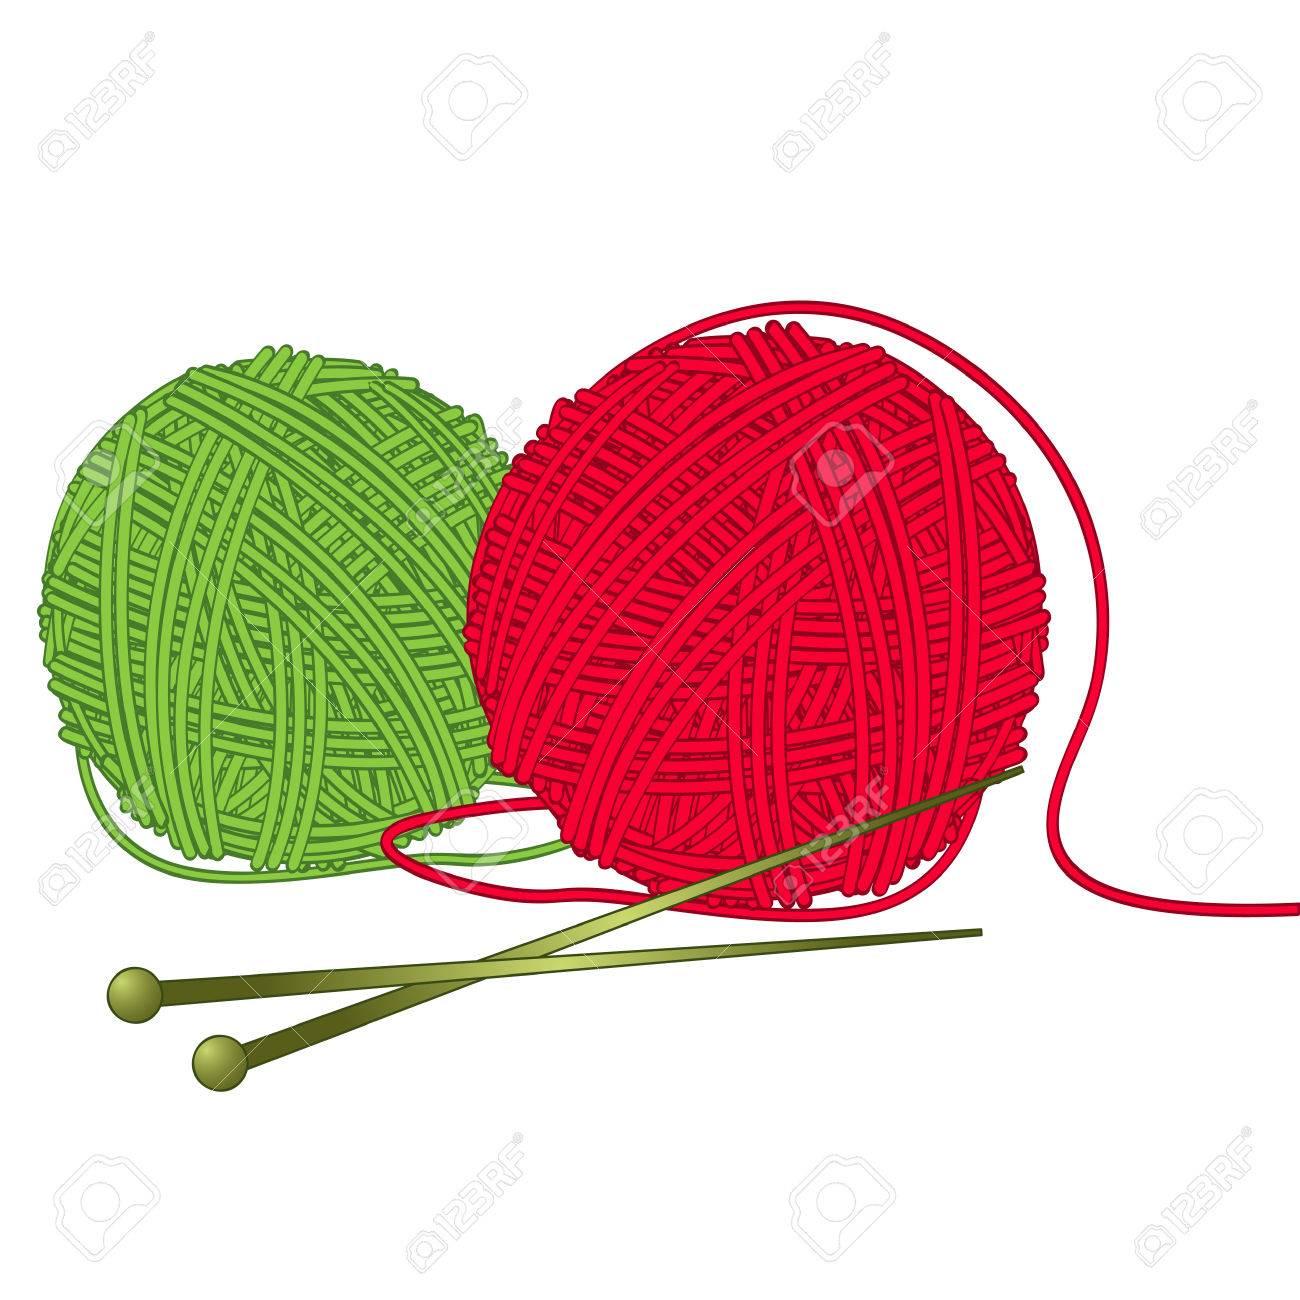 knitting wool, red and green yarn needle